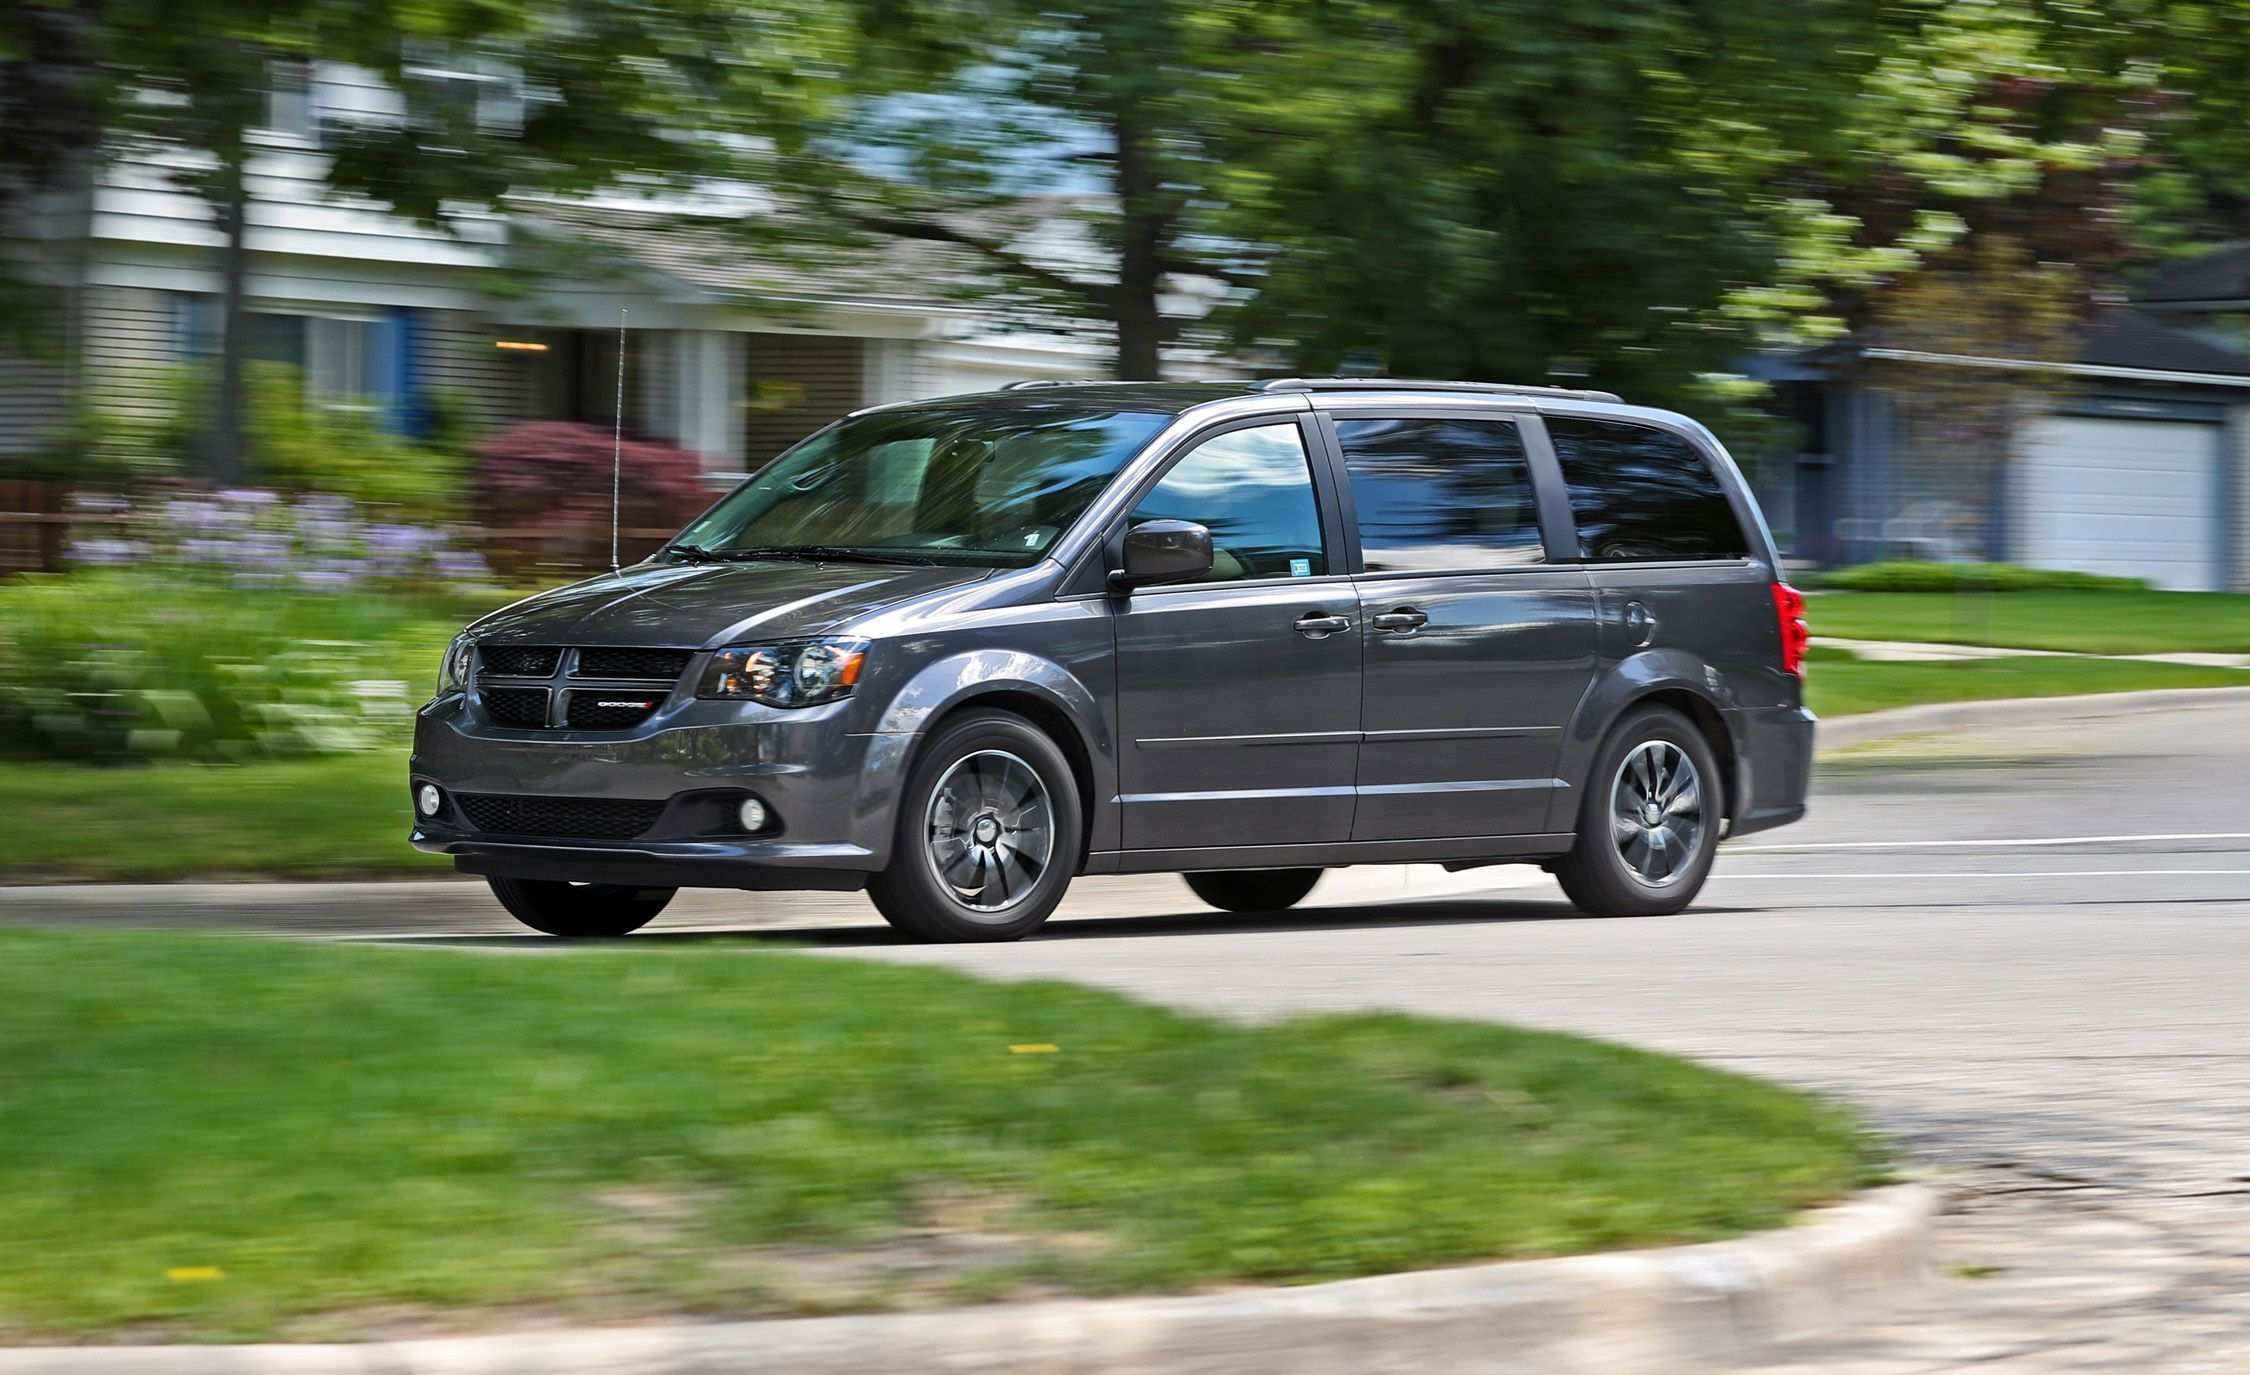 44 New 2019 Dodge Grand Caravan Specs And Review Research New by 2019 Dodge Grand Caravan Specs And Review